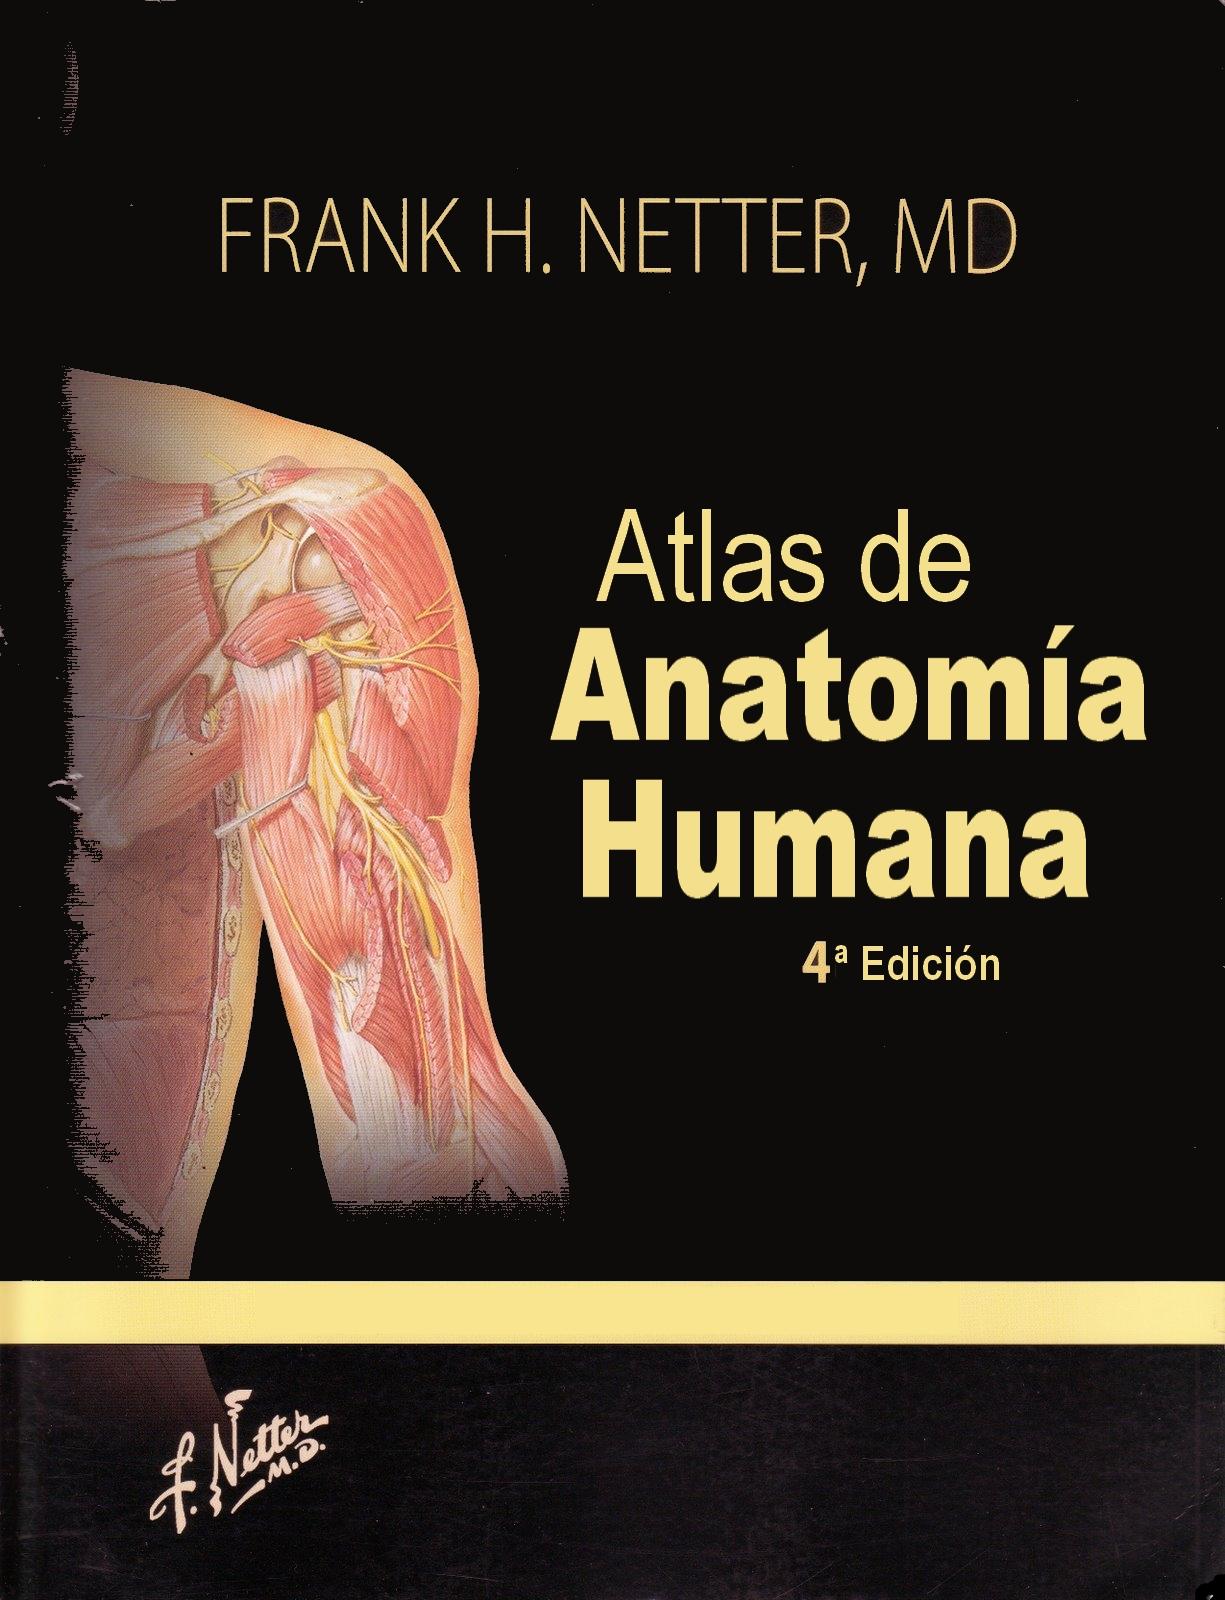 DoctorPato: Atlas de anatomia humana - Netter 4° Edicion